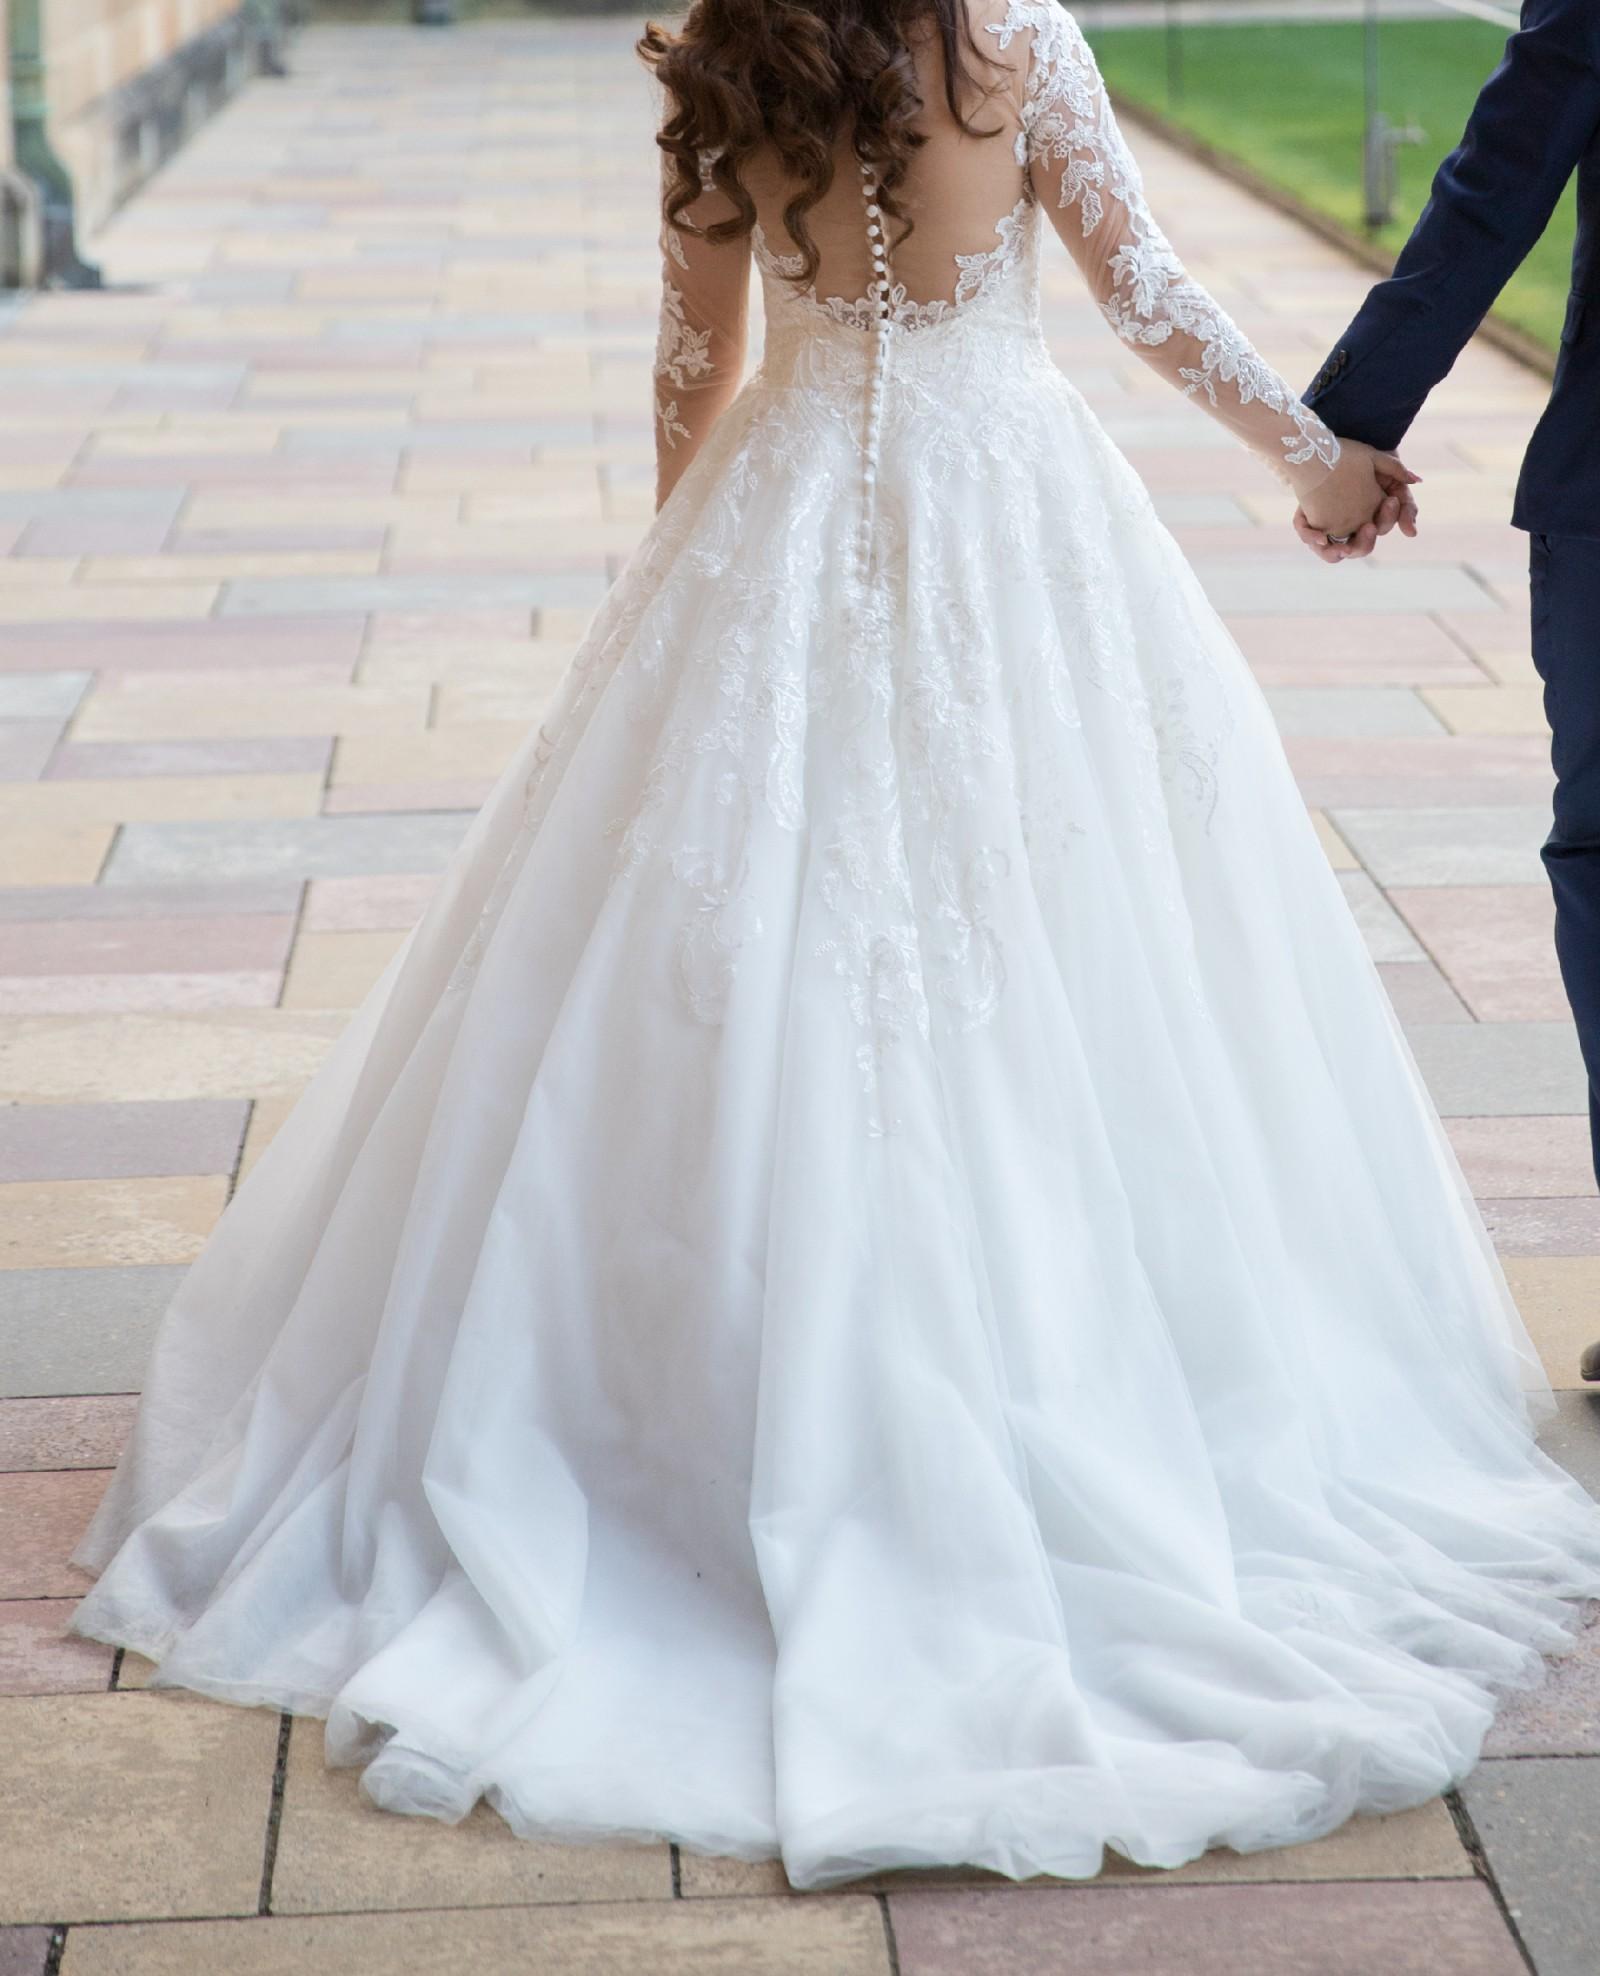 737e8564402 Allure Romance 3059 Second Hand Wedding Dress on Sale 54% Off - Stillwhite  United Kingdom